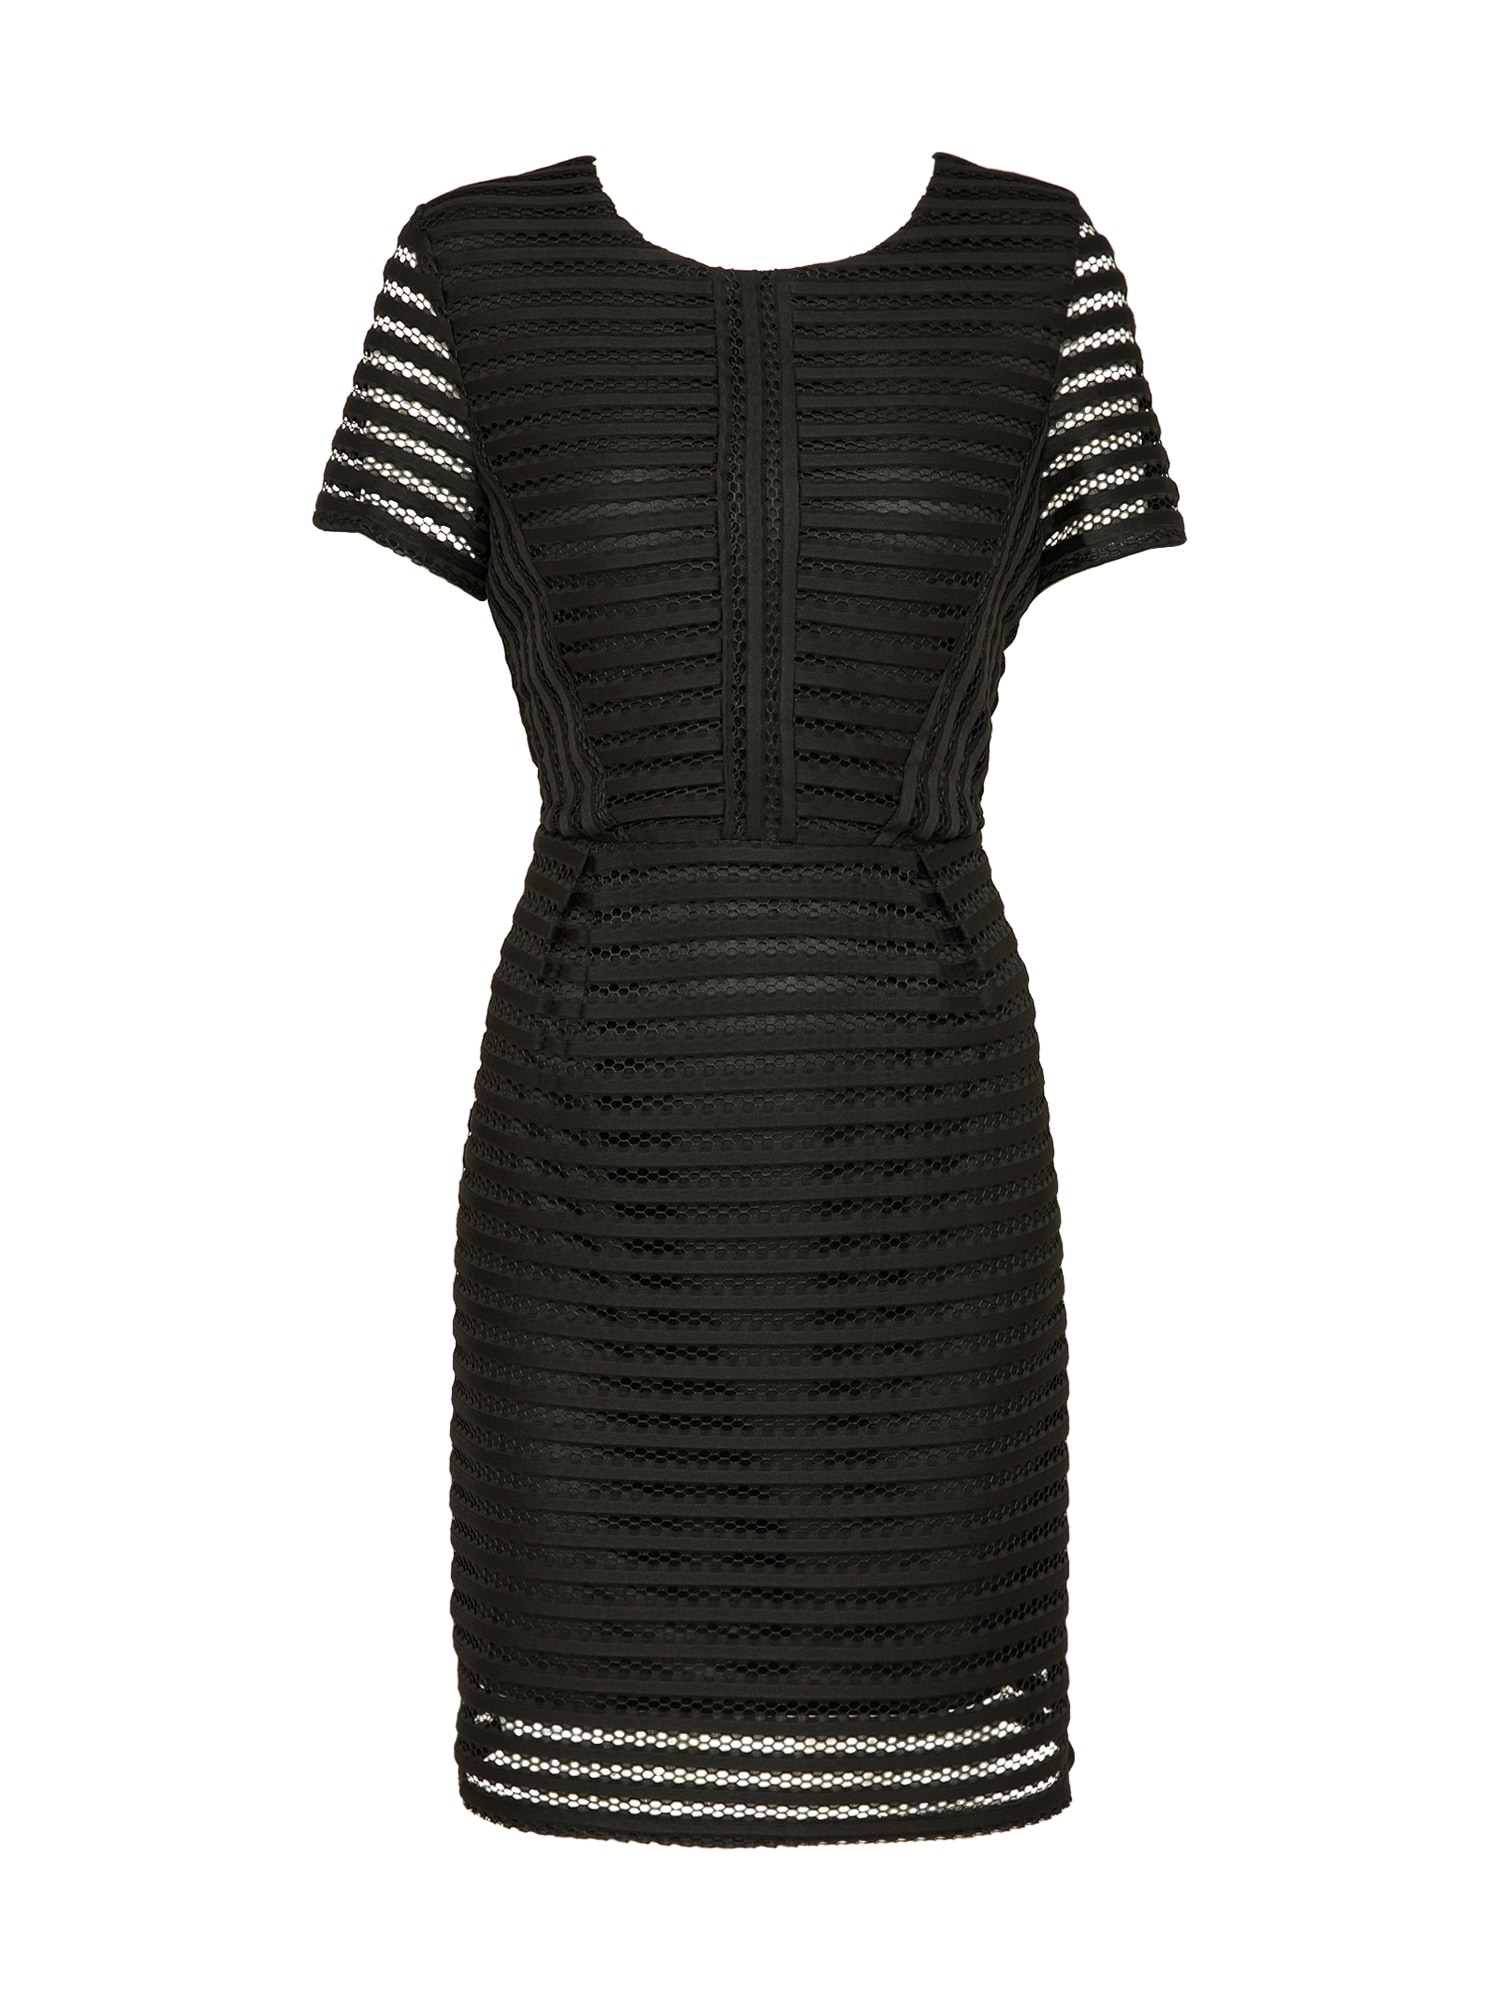 Šaty Lace Pannelled schwarz Boohoo